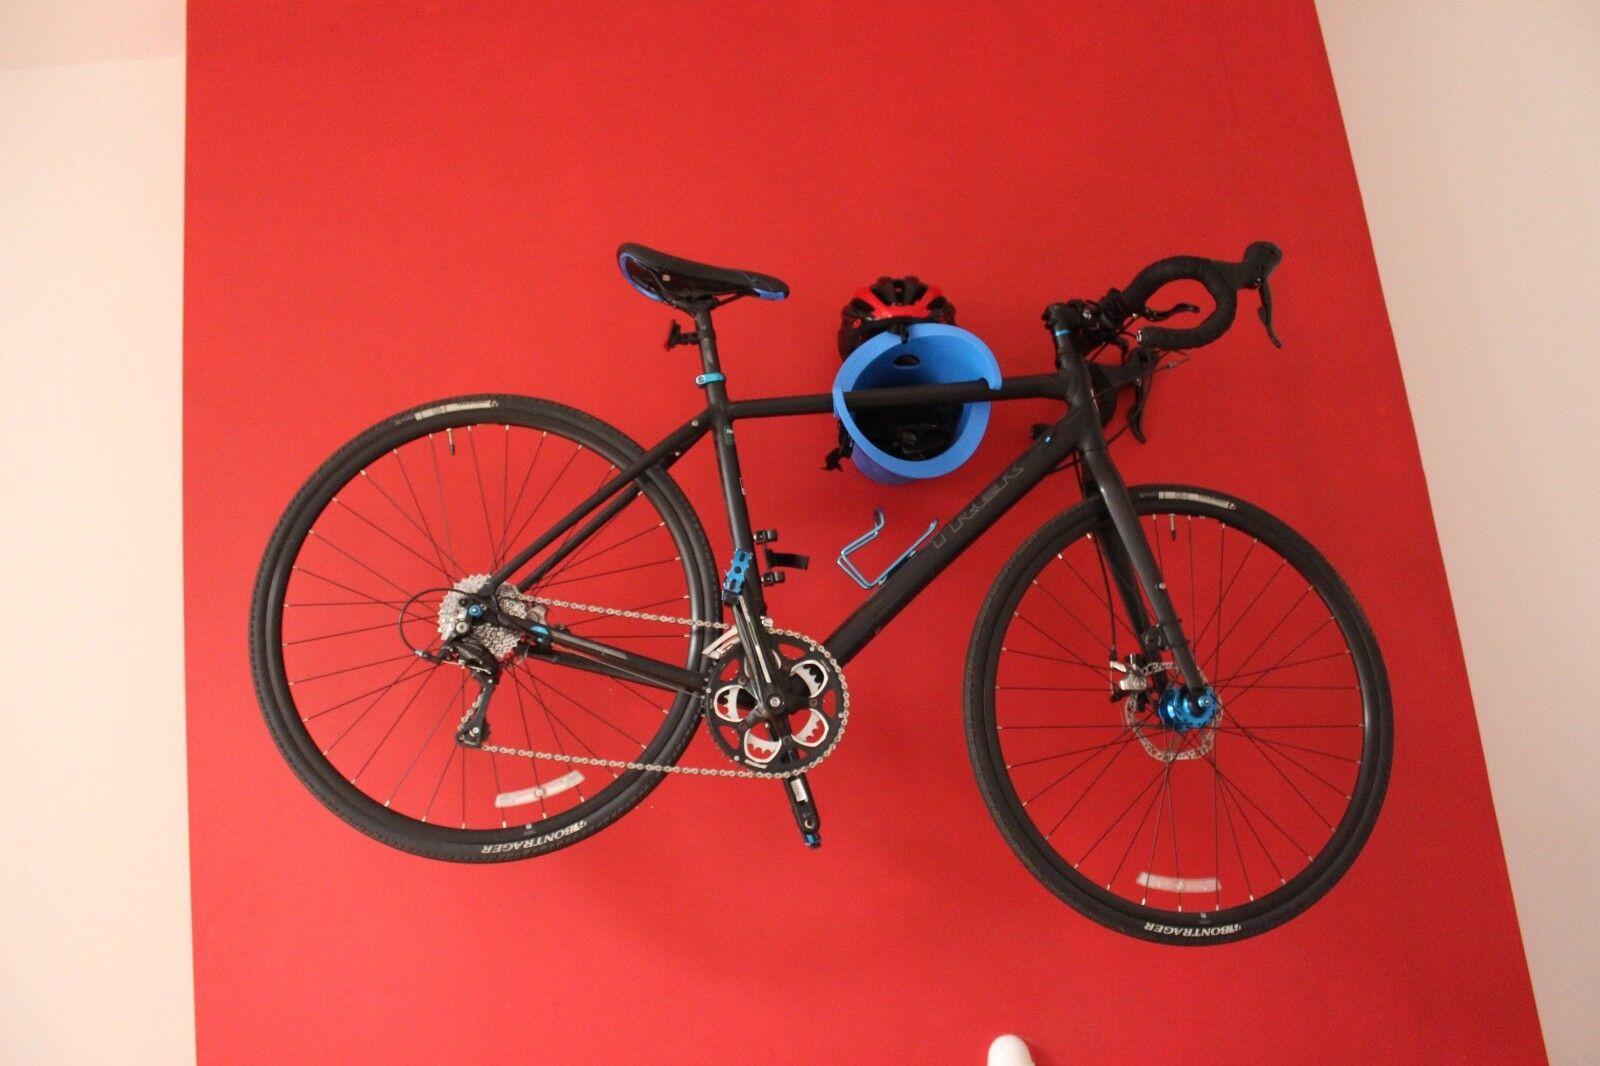 Trek Crossrip Elite Bike 54cm Excellent Condition